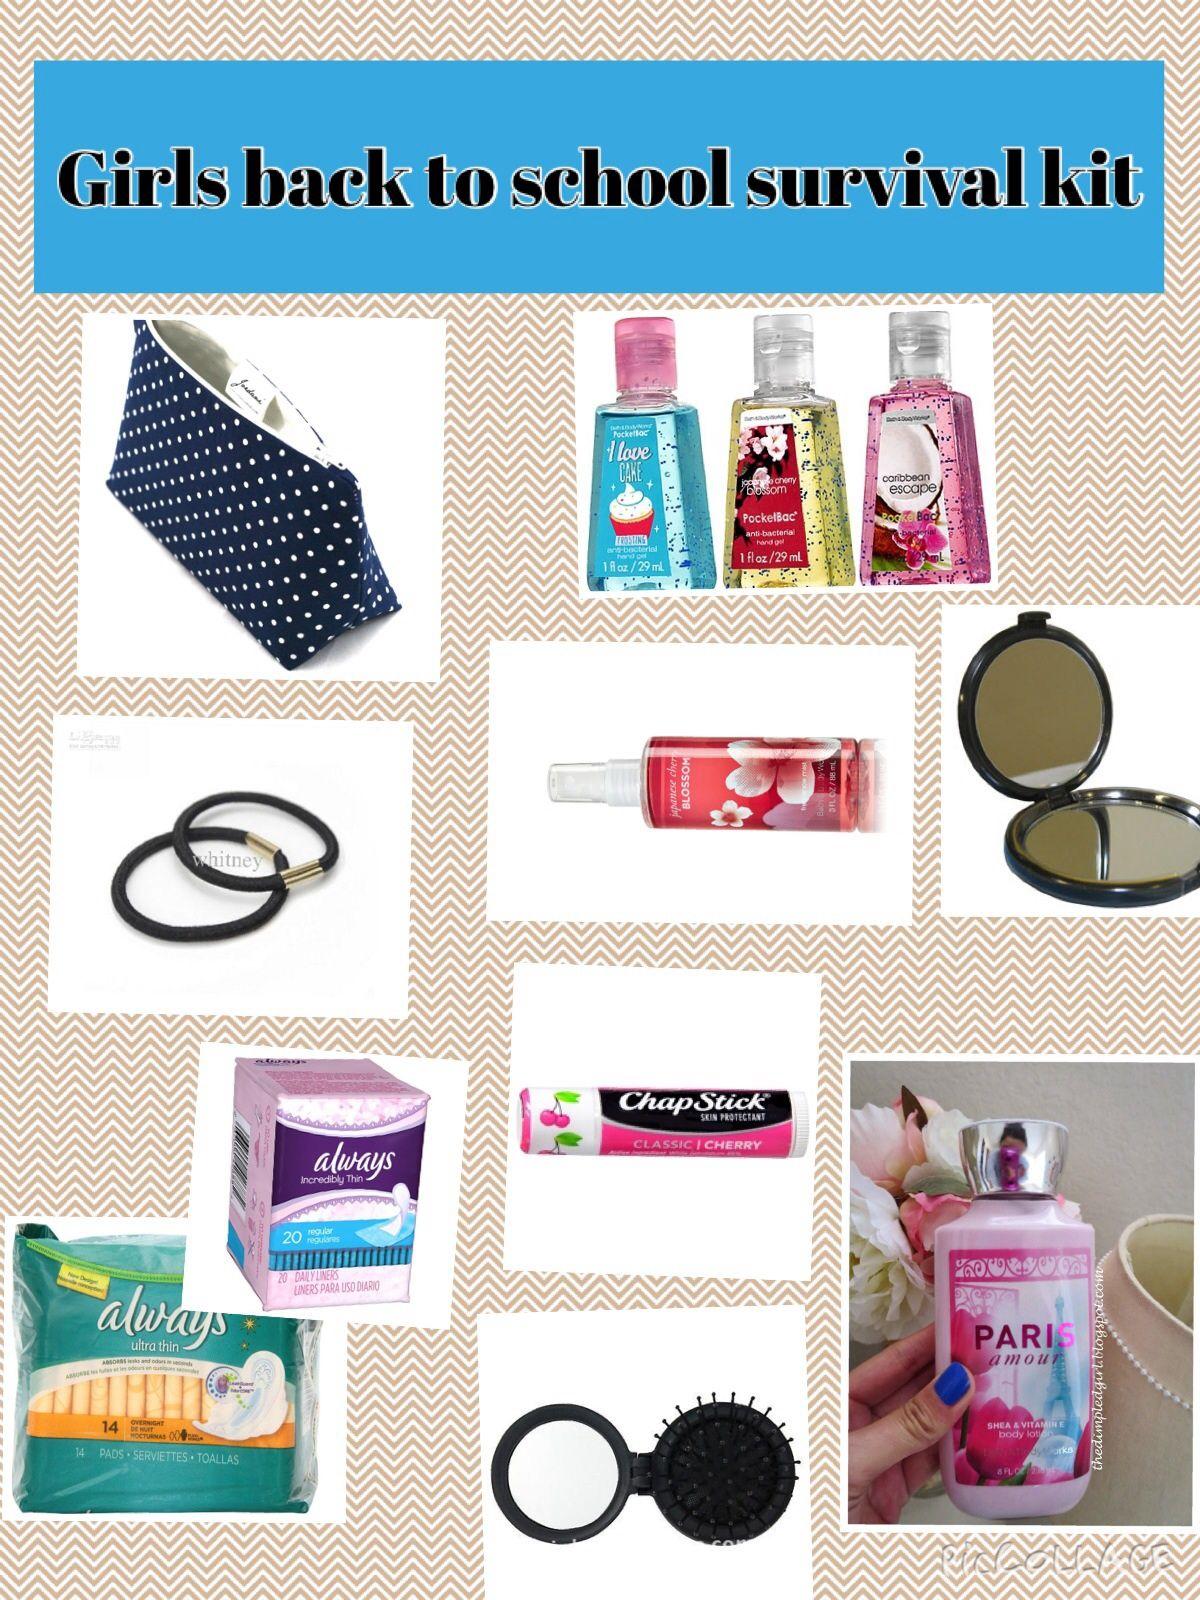 I made this Back to school locker kit for girls